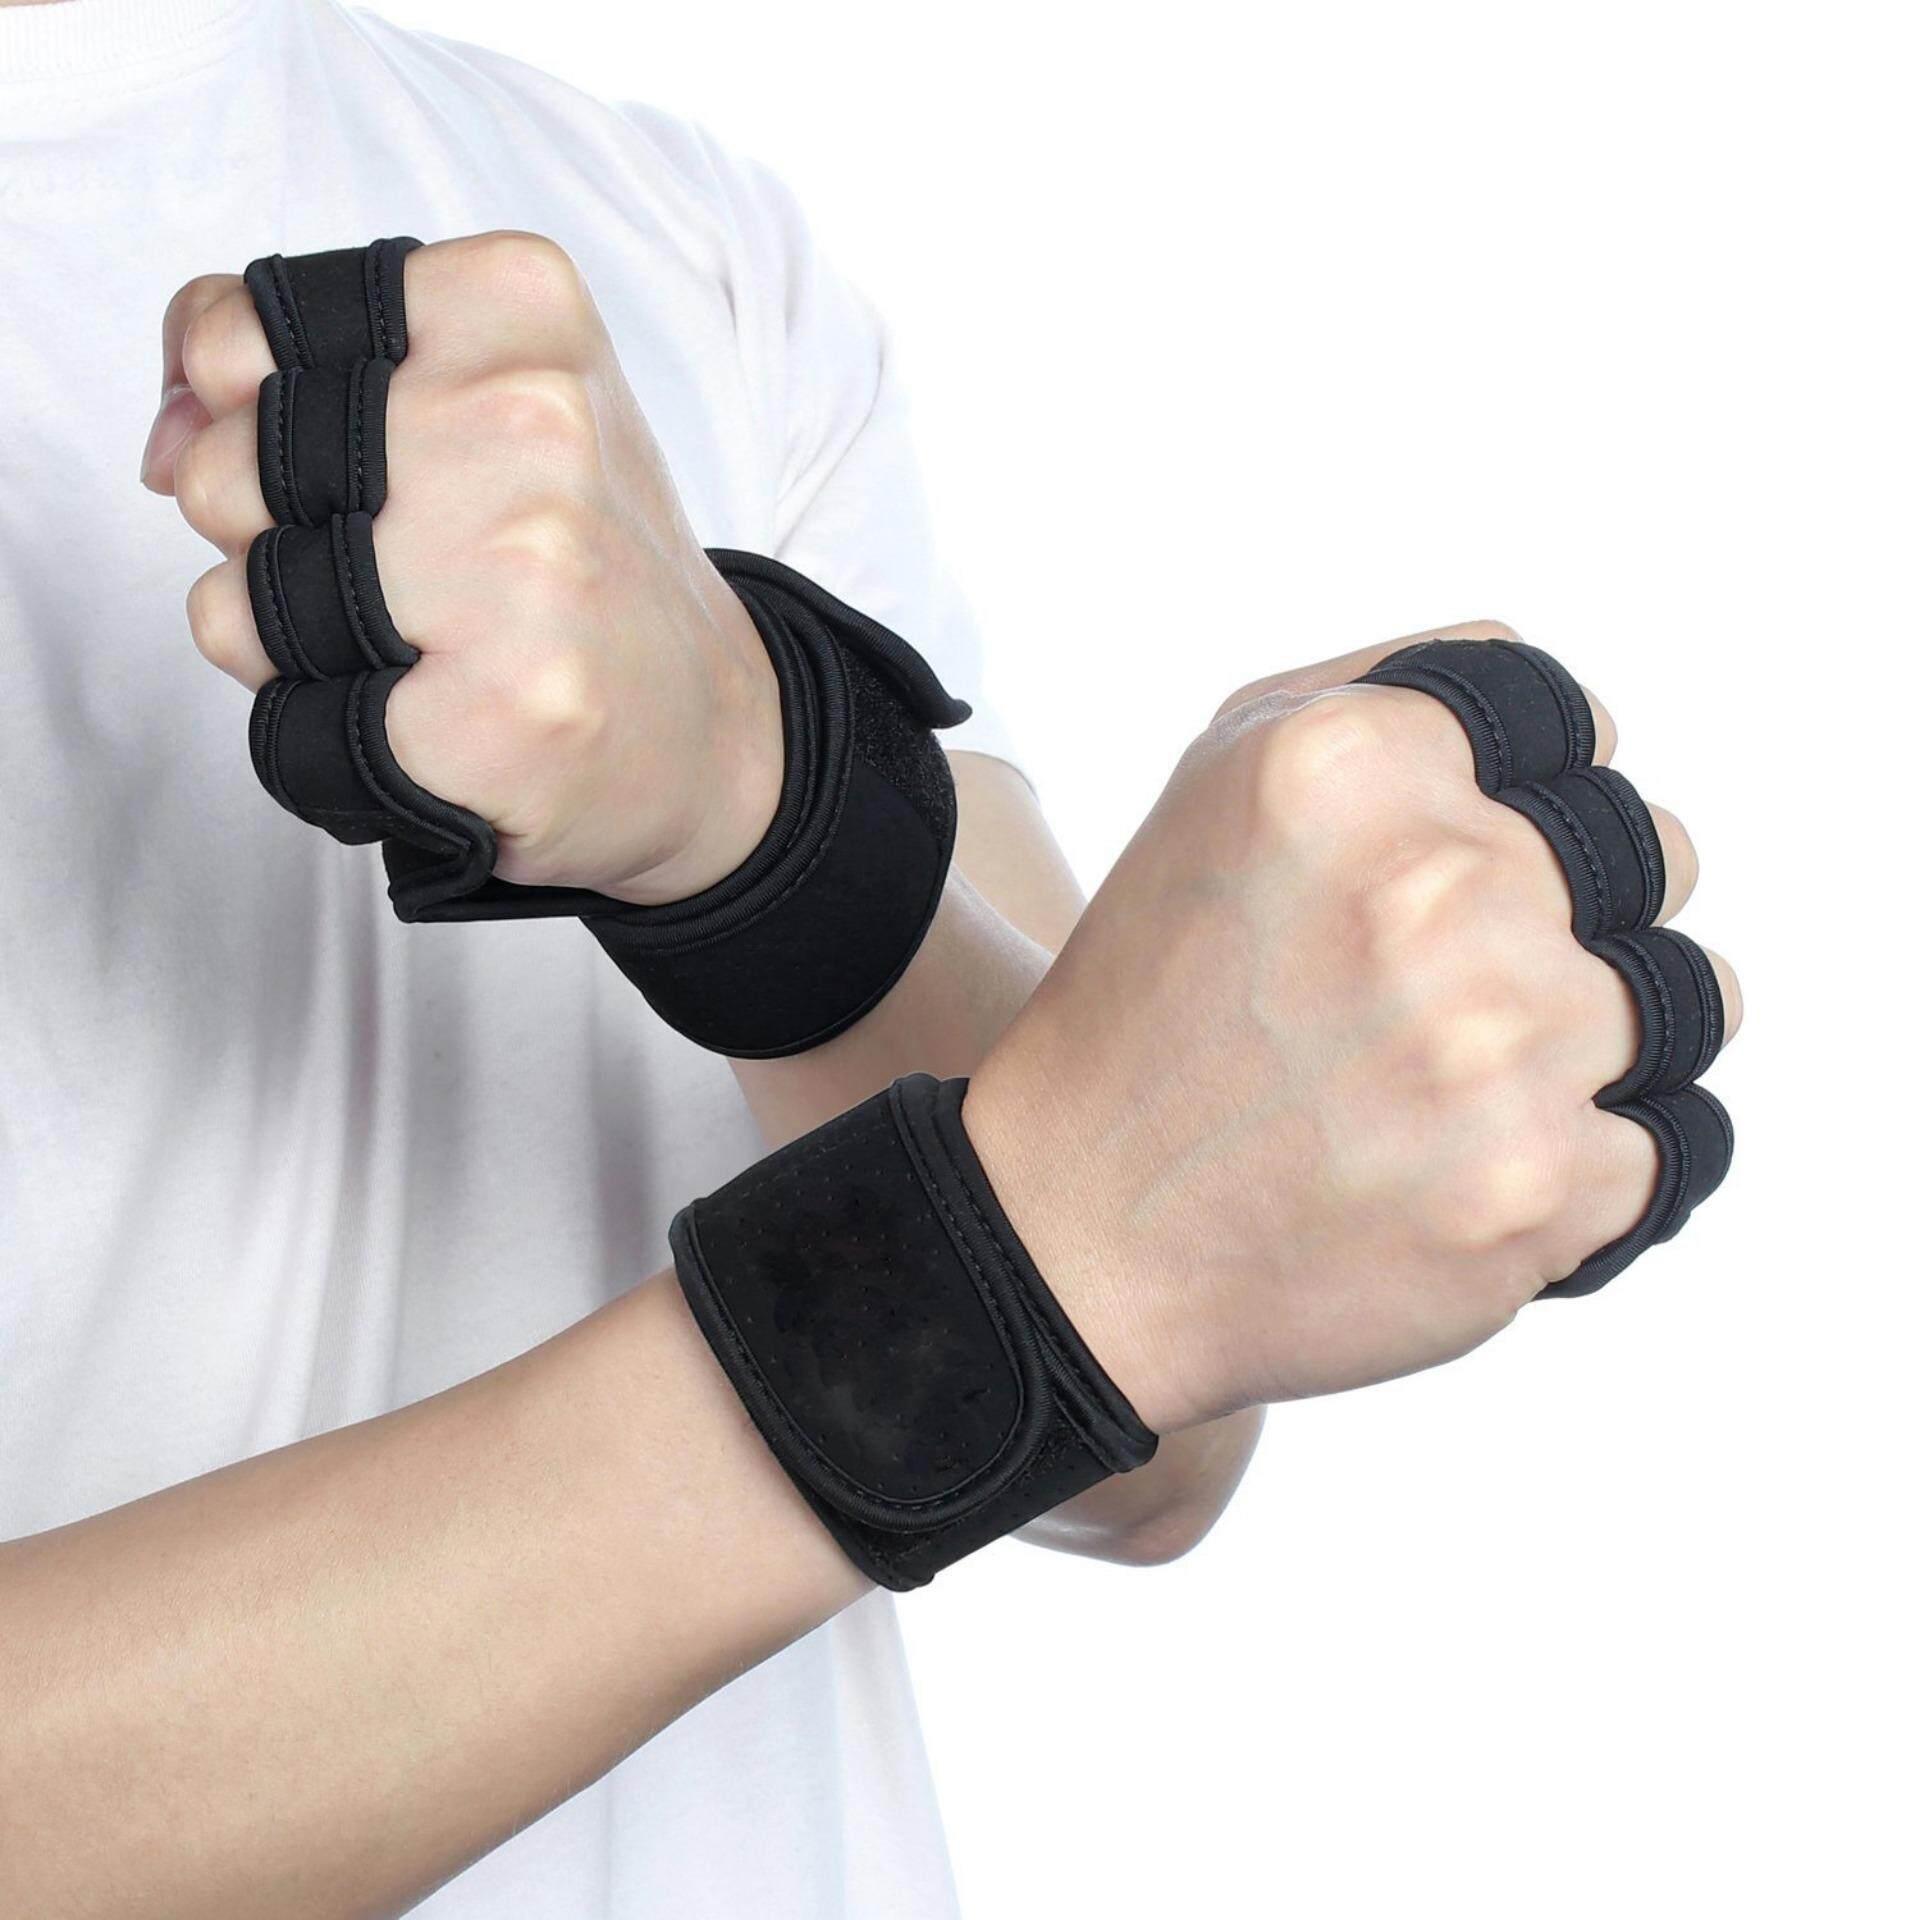 Training Gloves Support Sport Workout Exercise Lifting Half Finger Gloves - intl